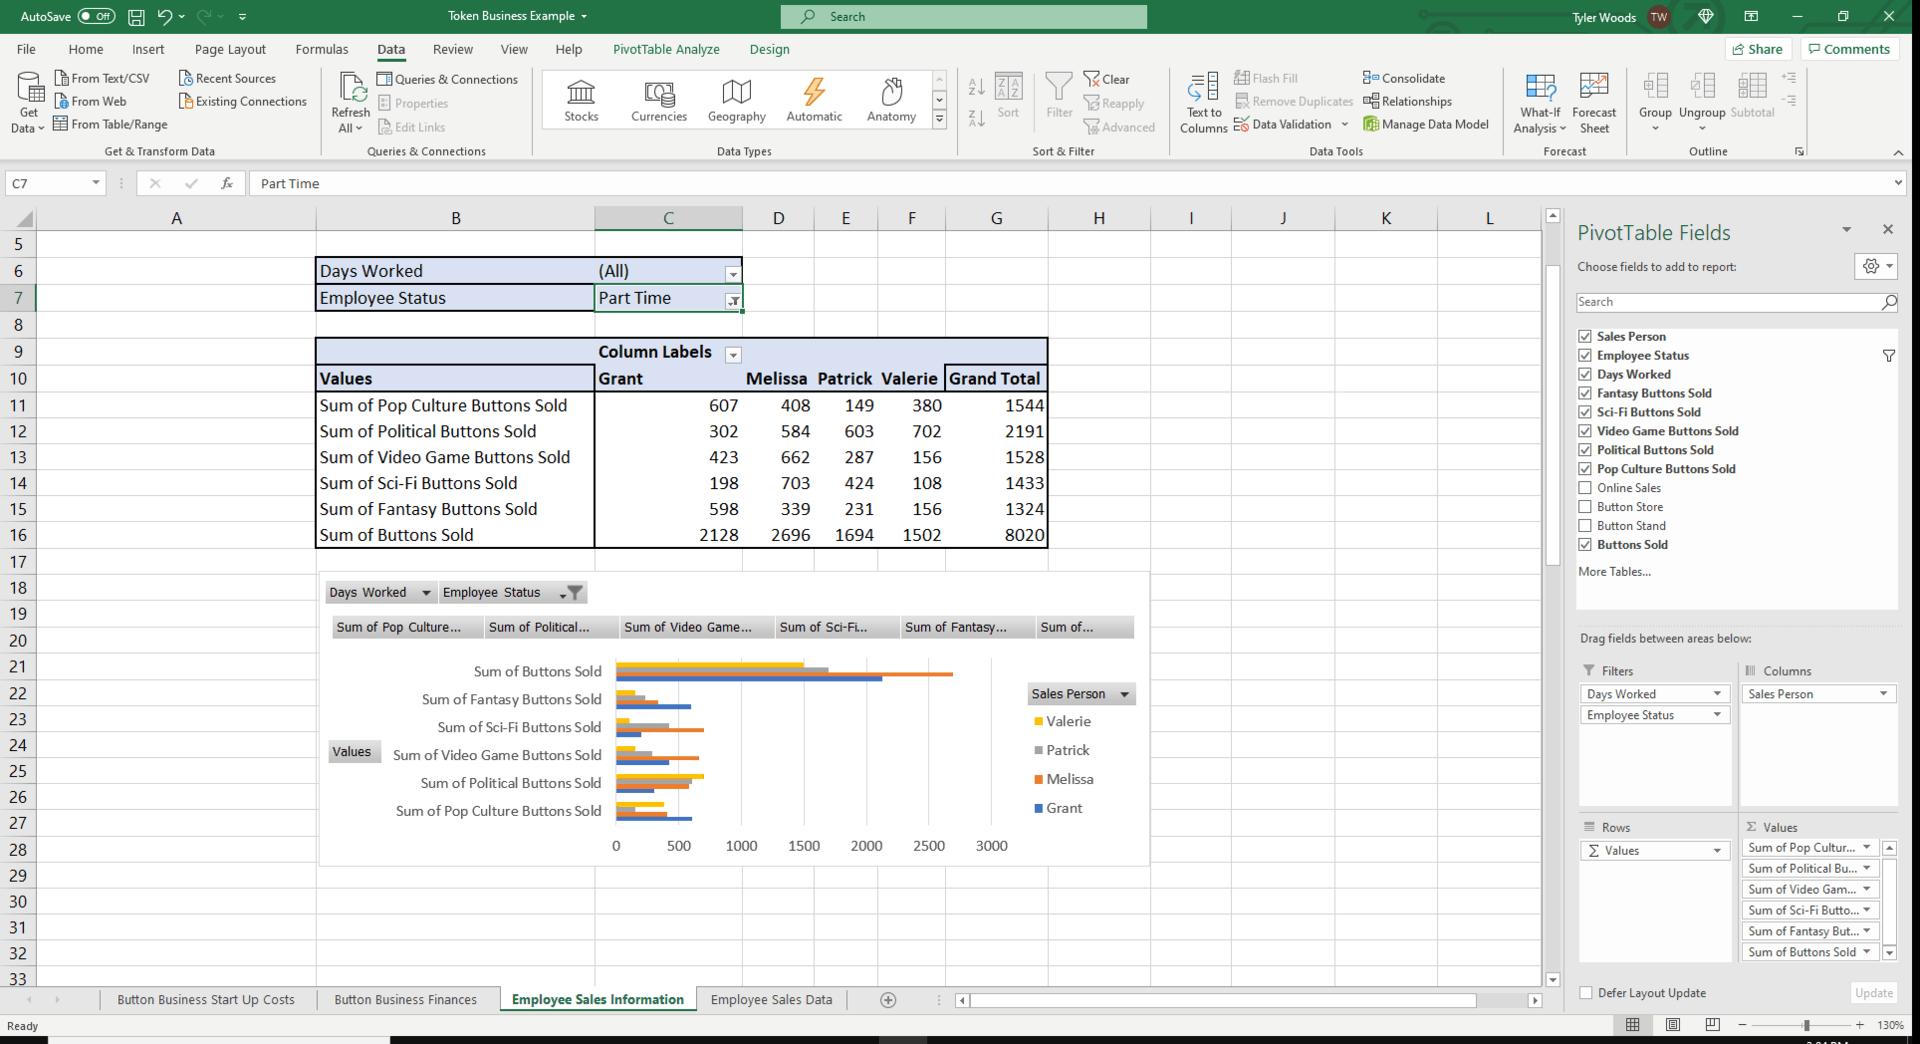 Employee Sales Data 3